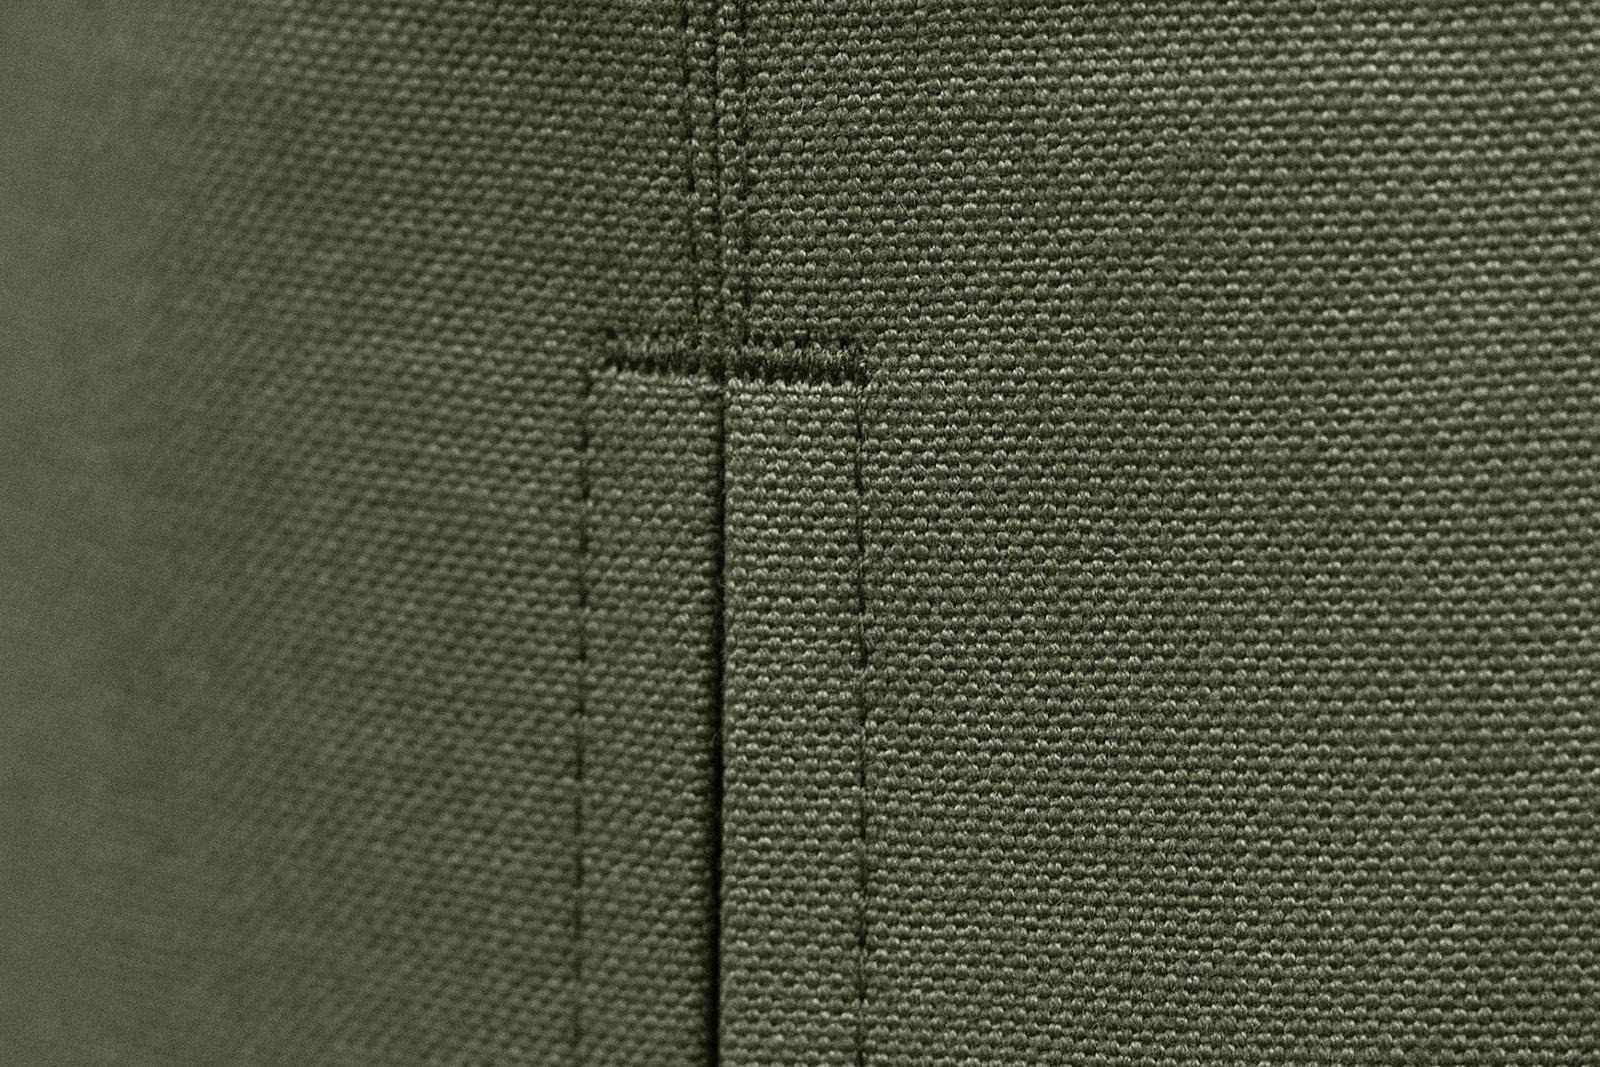 engineer-jacket-cotton-canvas-green-6@2x.jpg